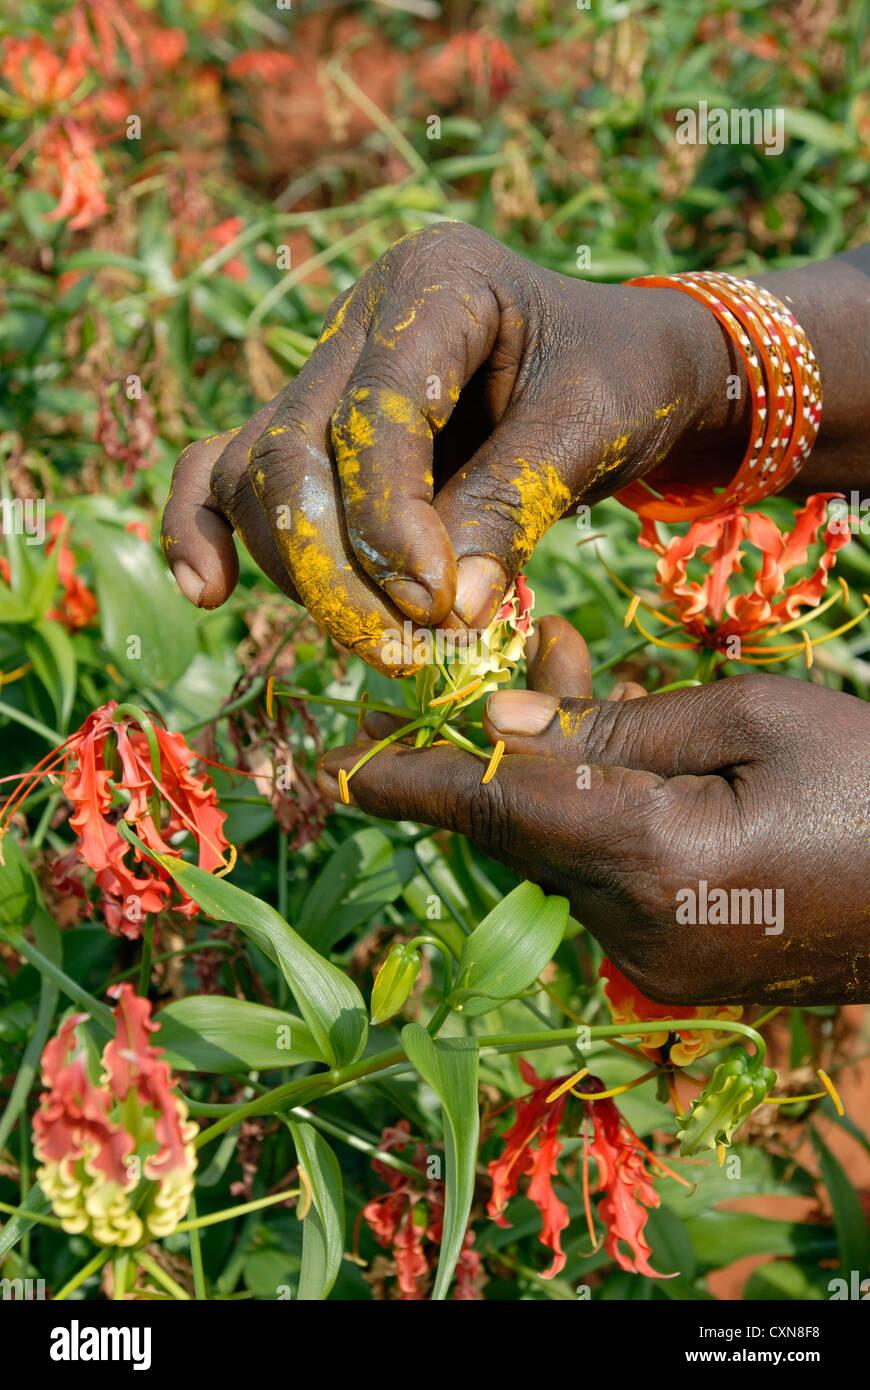 Gloriosa superba linn. (Medicinal plant) in Dharapuram,Tamil Nadu,India Stock Photo